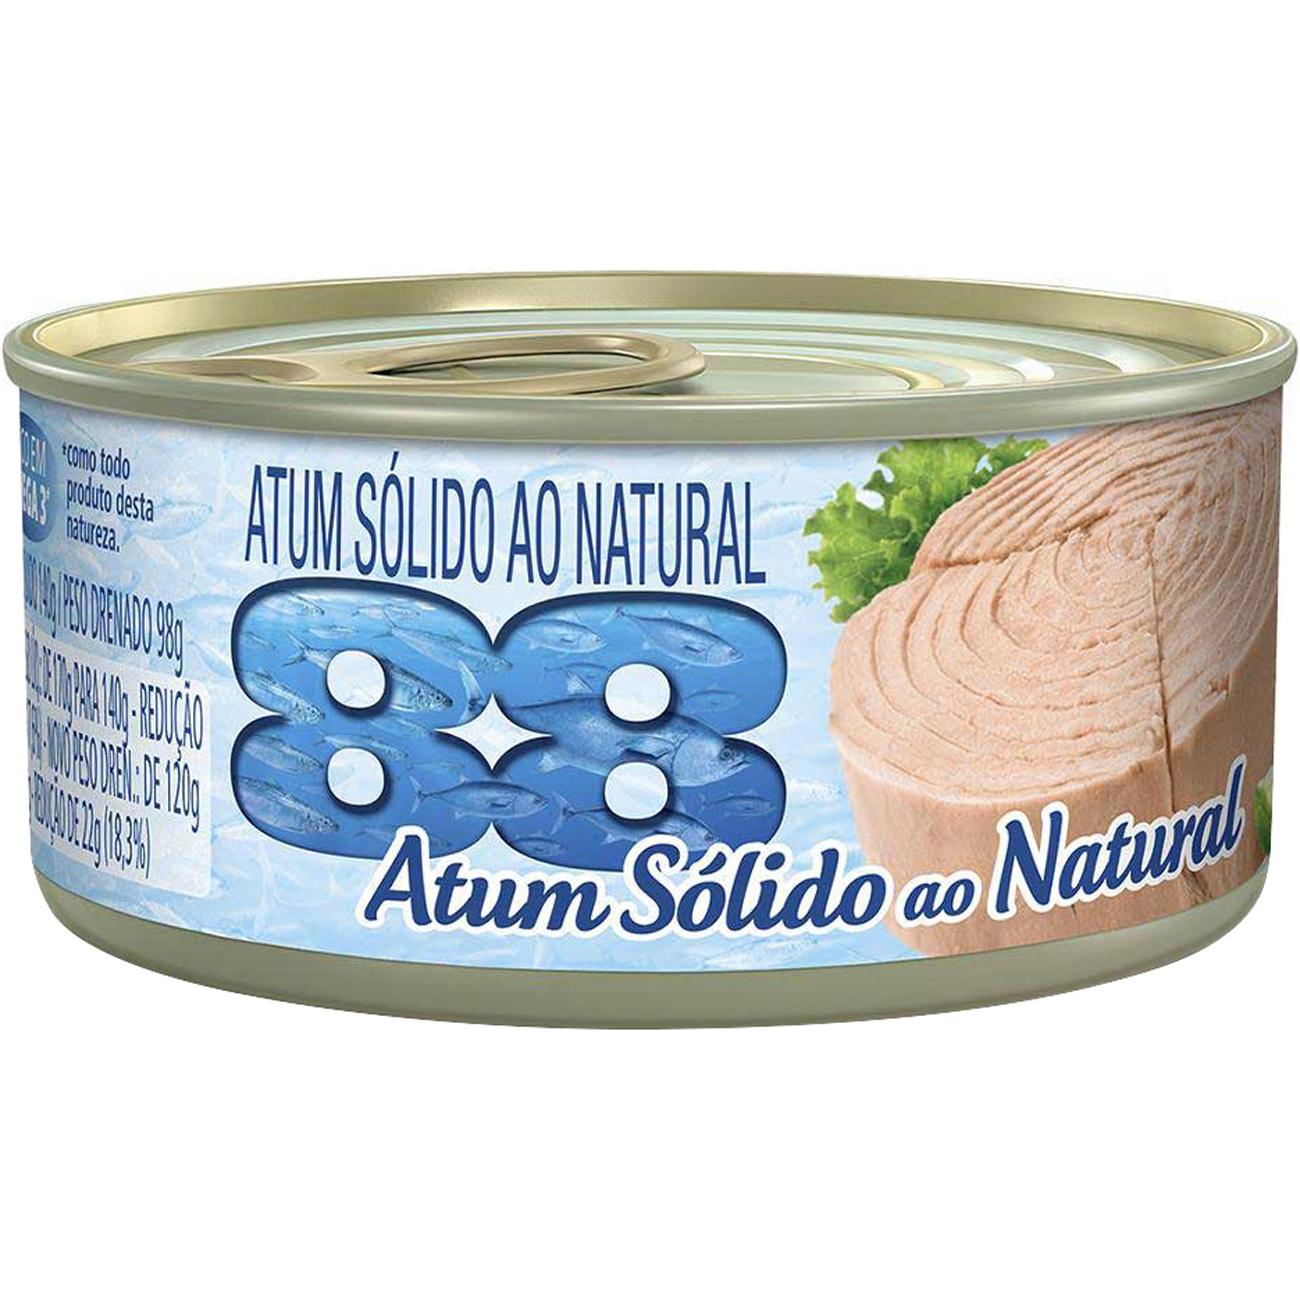 Atum 88 Solido Natural 140G